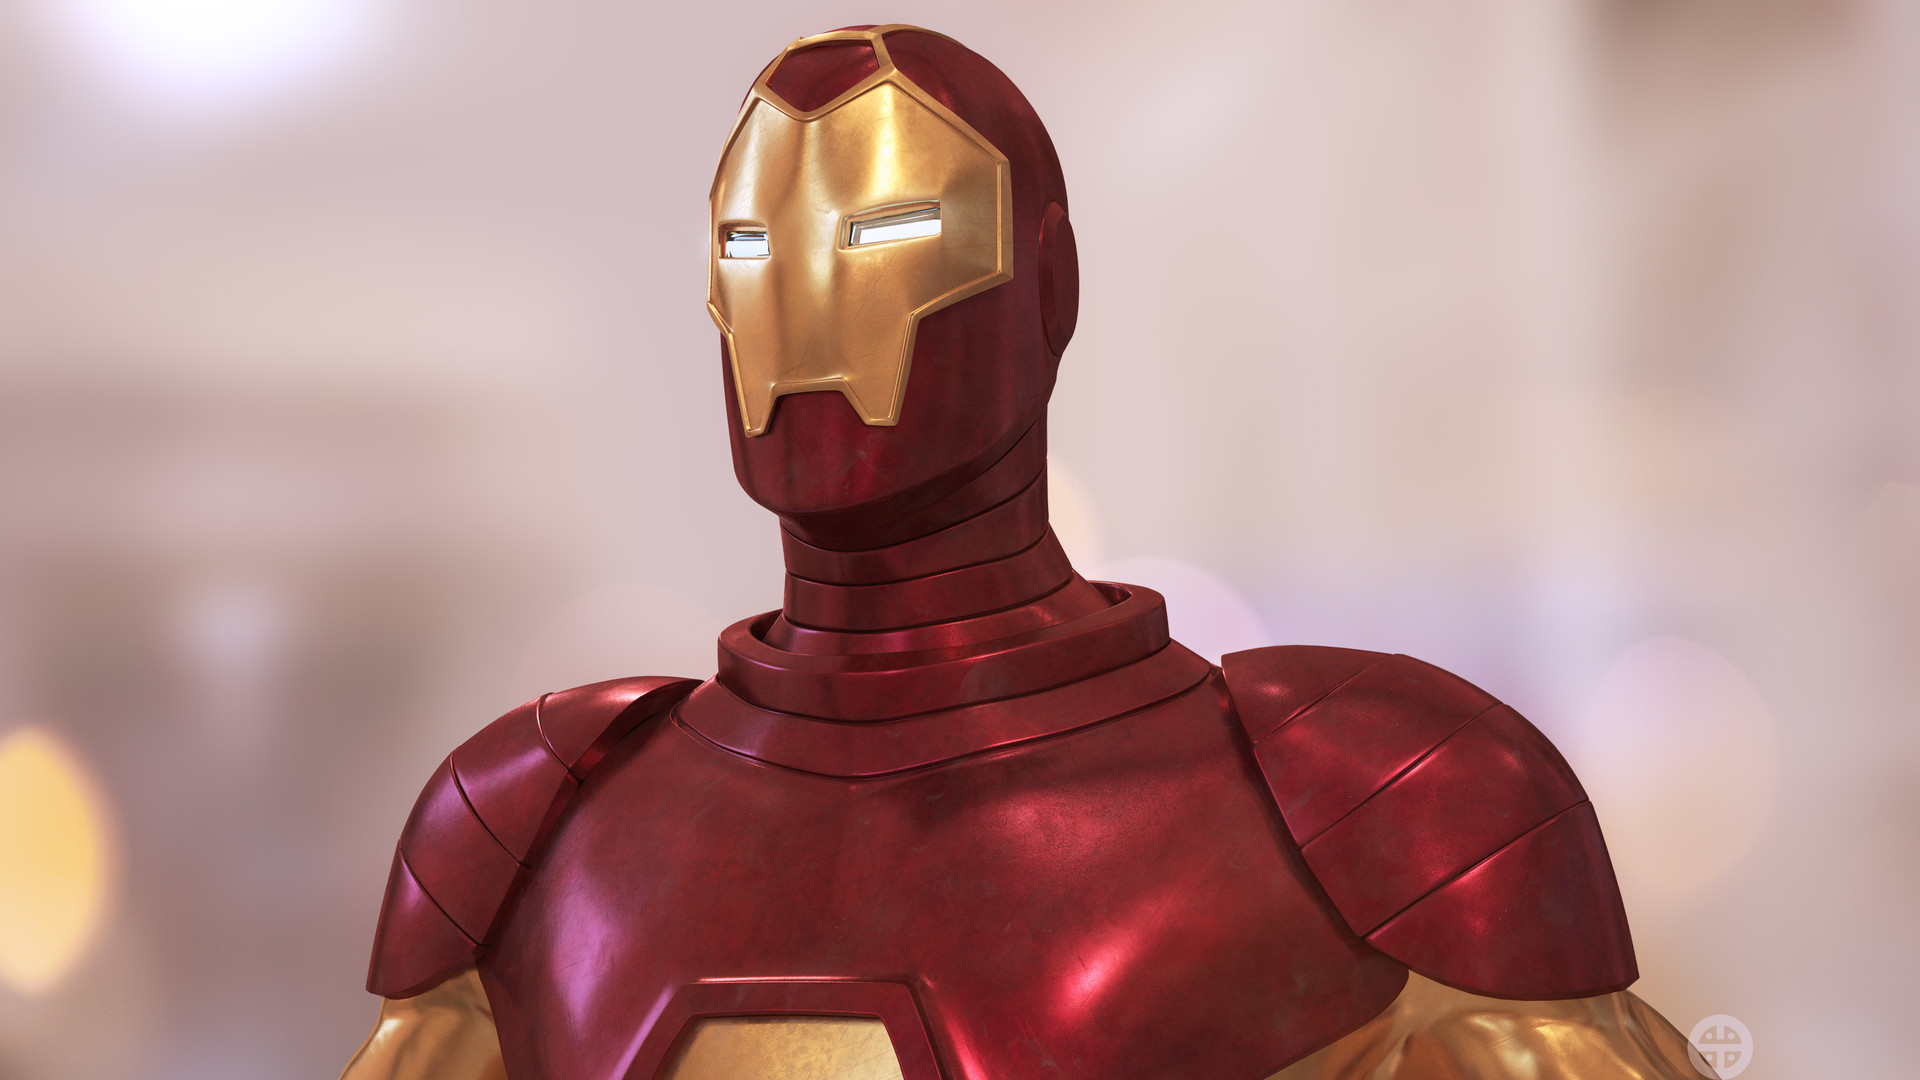 Oscar trejo ironman closeup